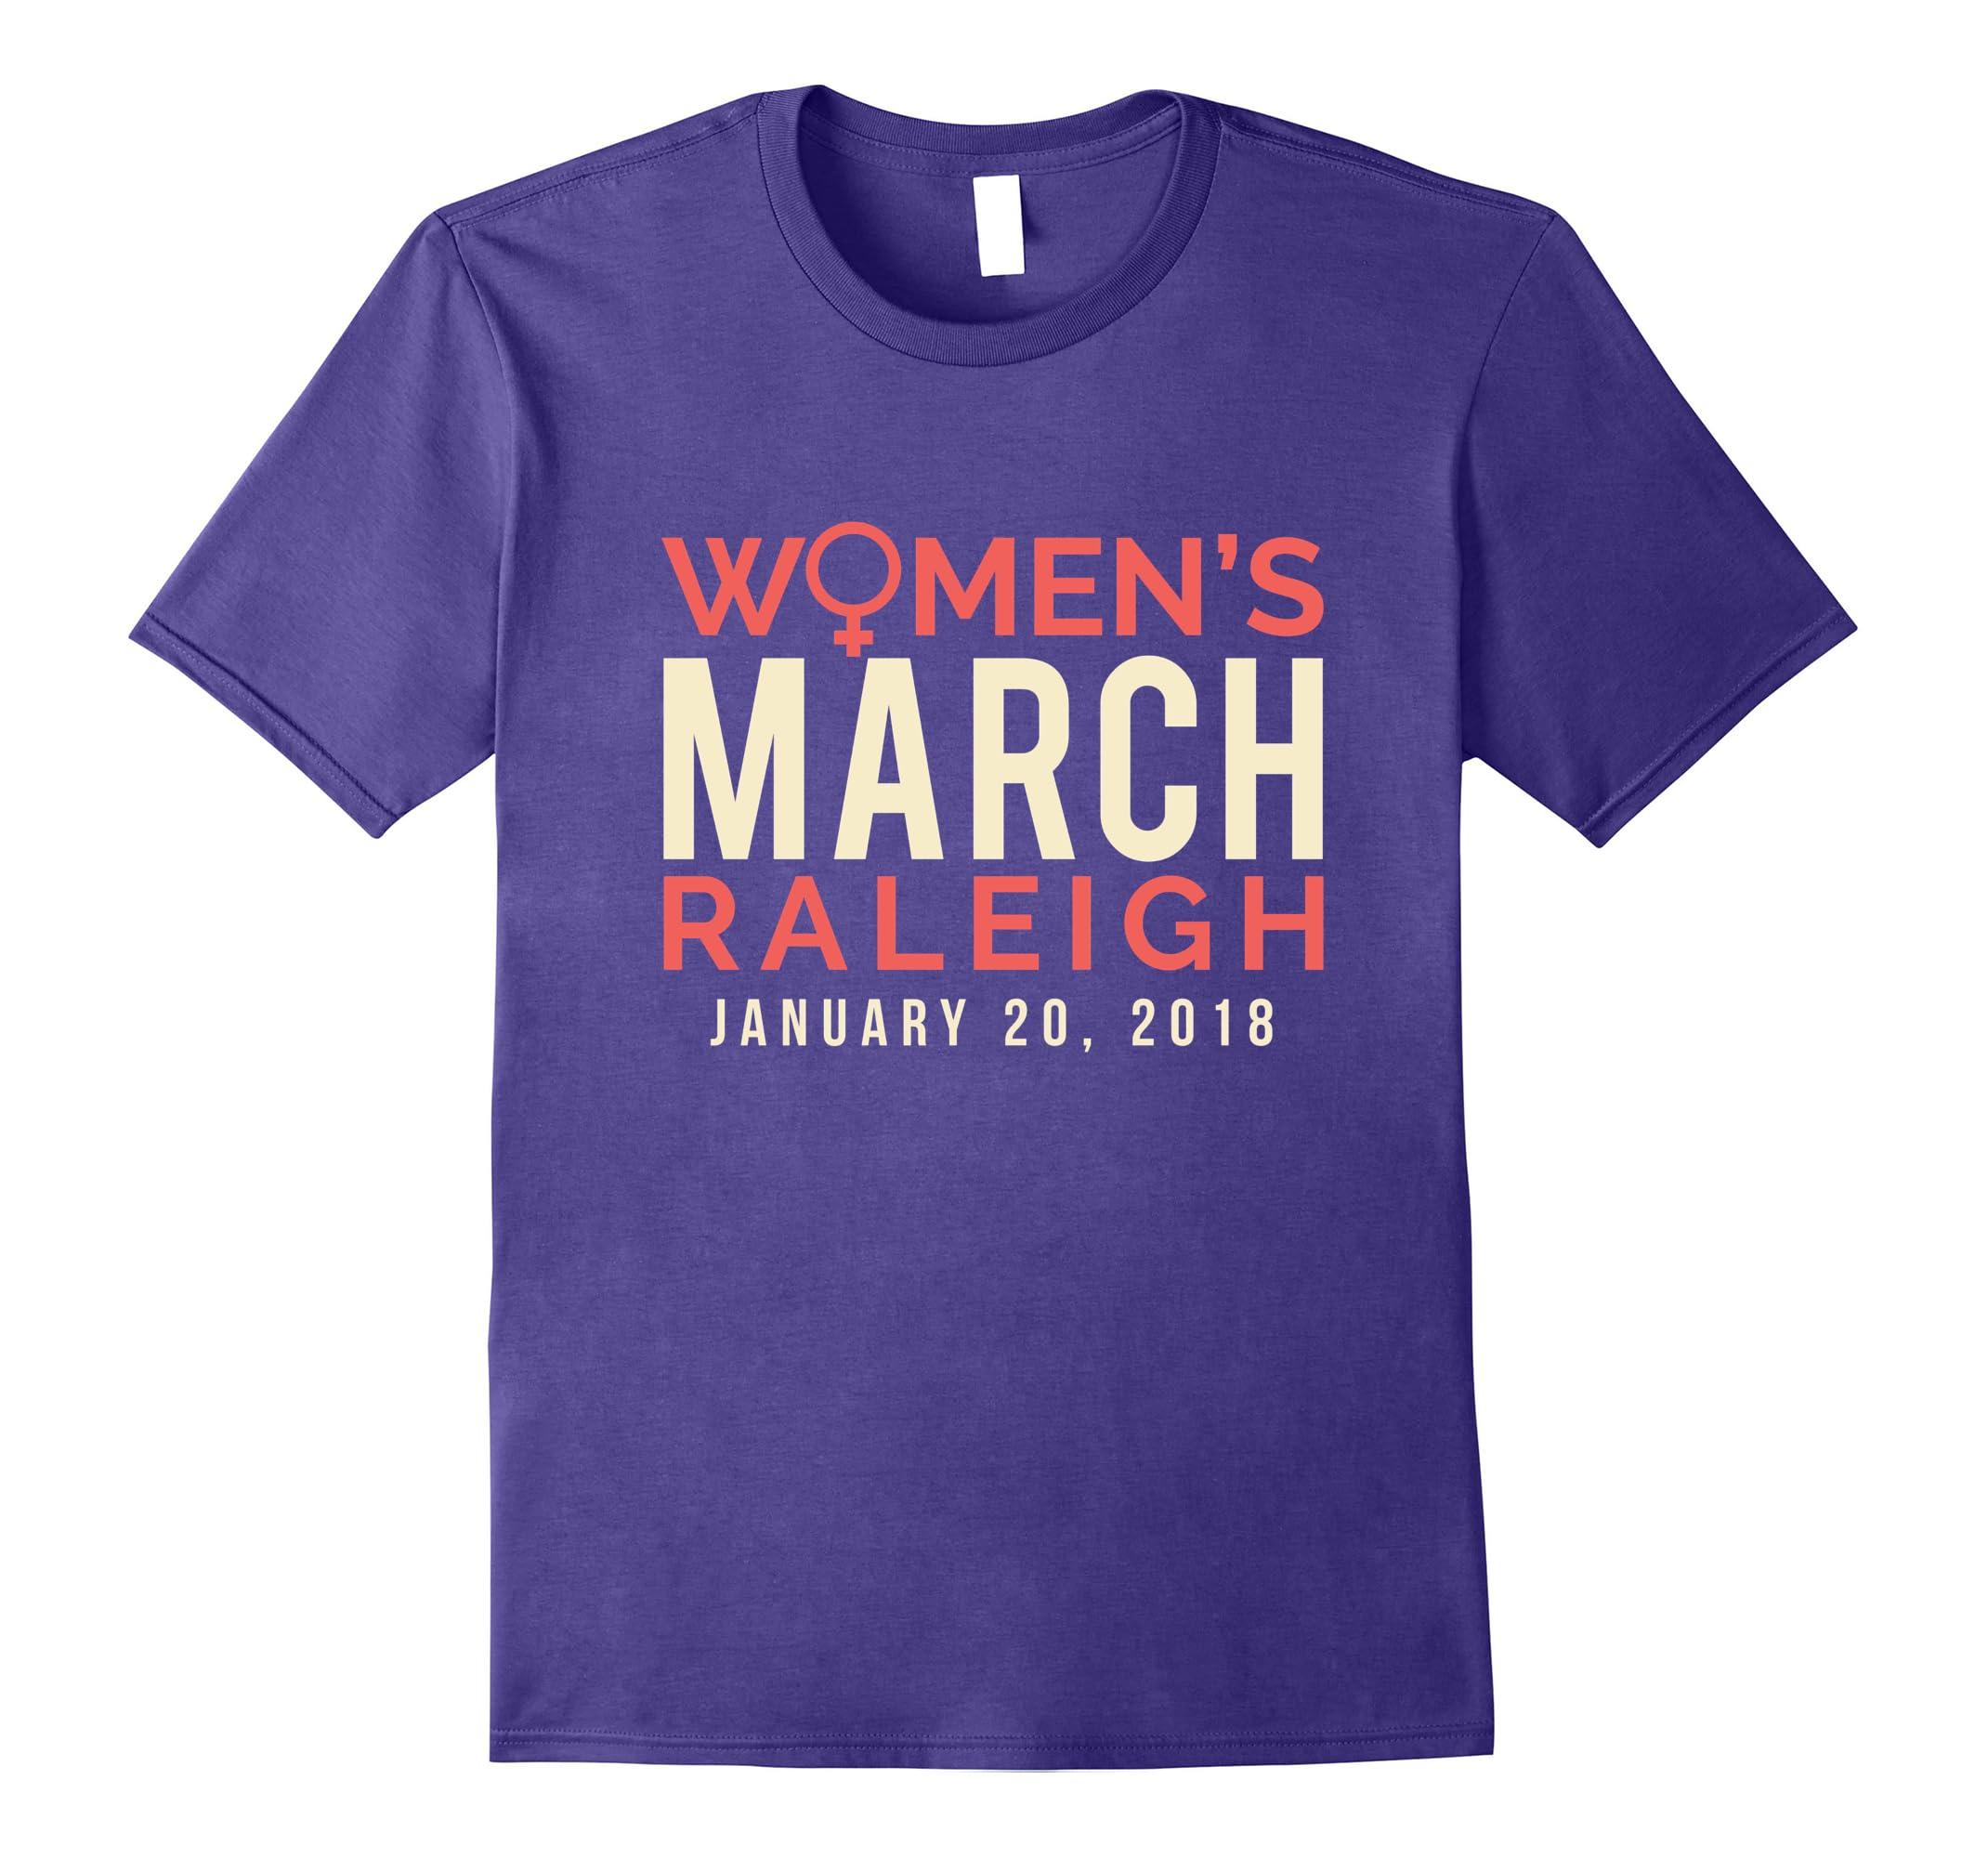 Raleigh NC Women's March January 20 2018 Tee Shirt-RT